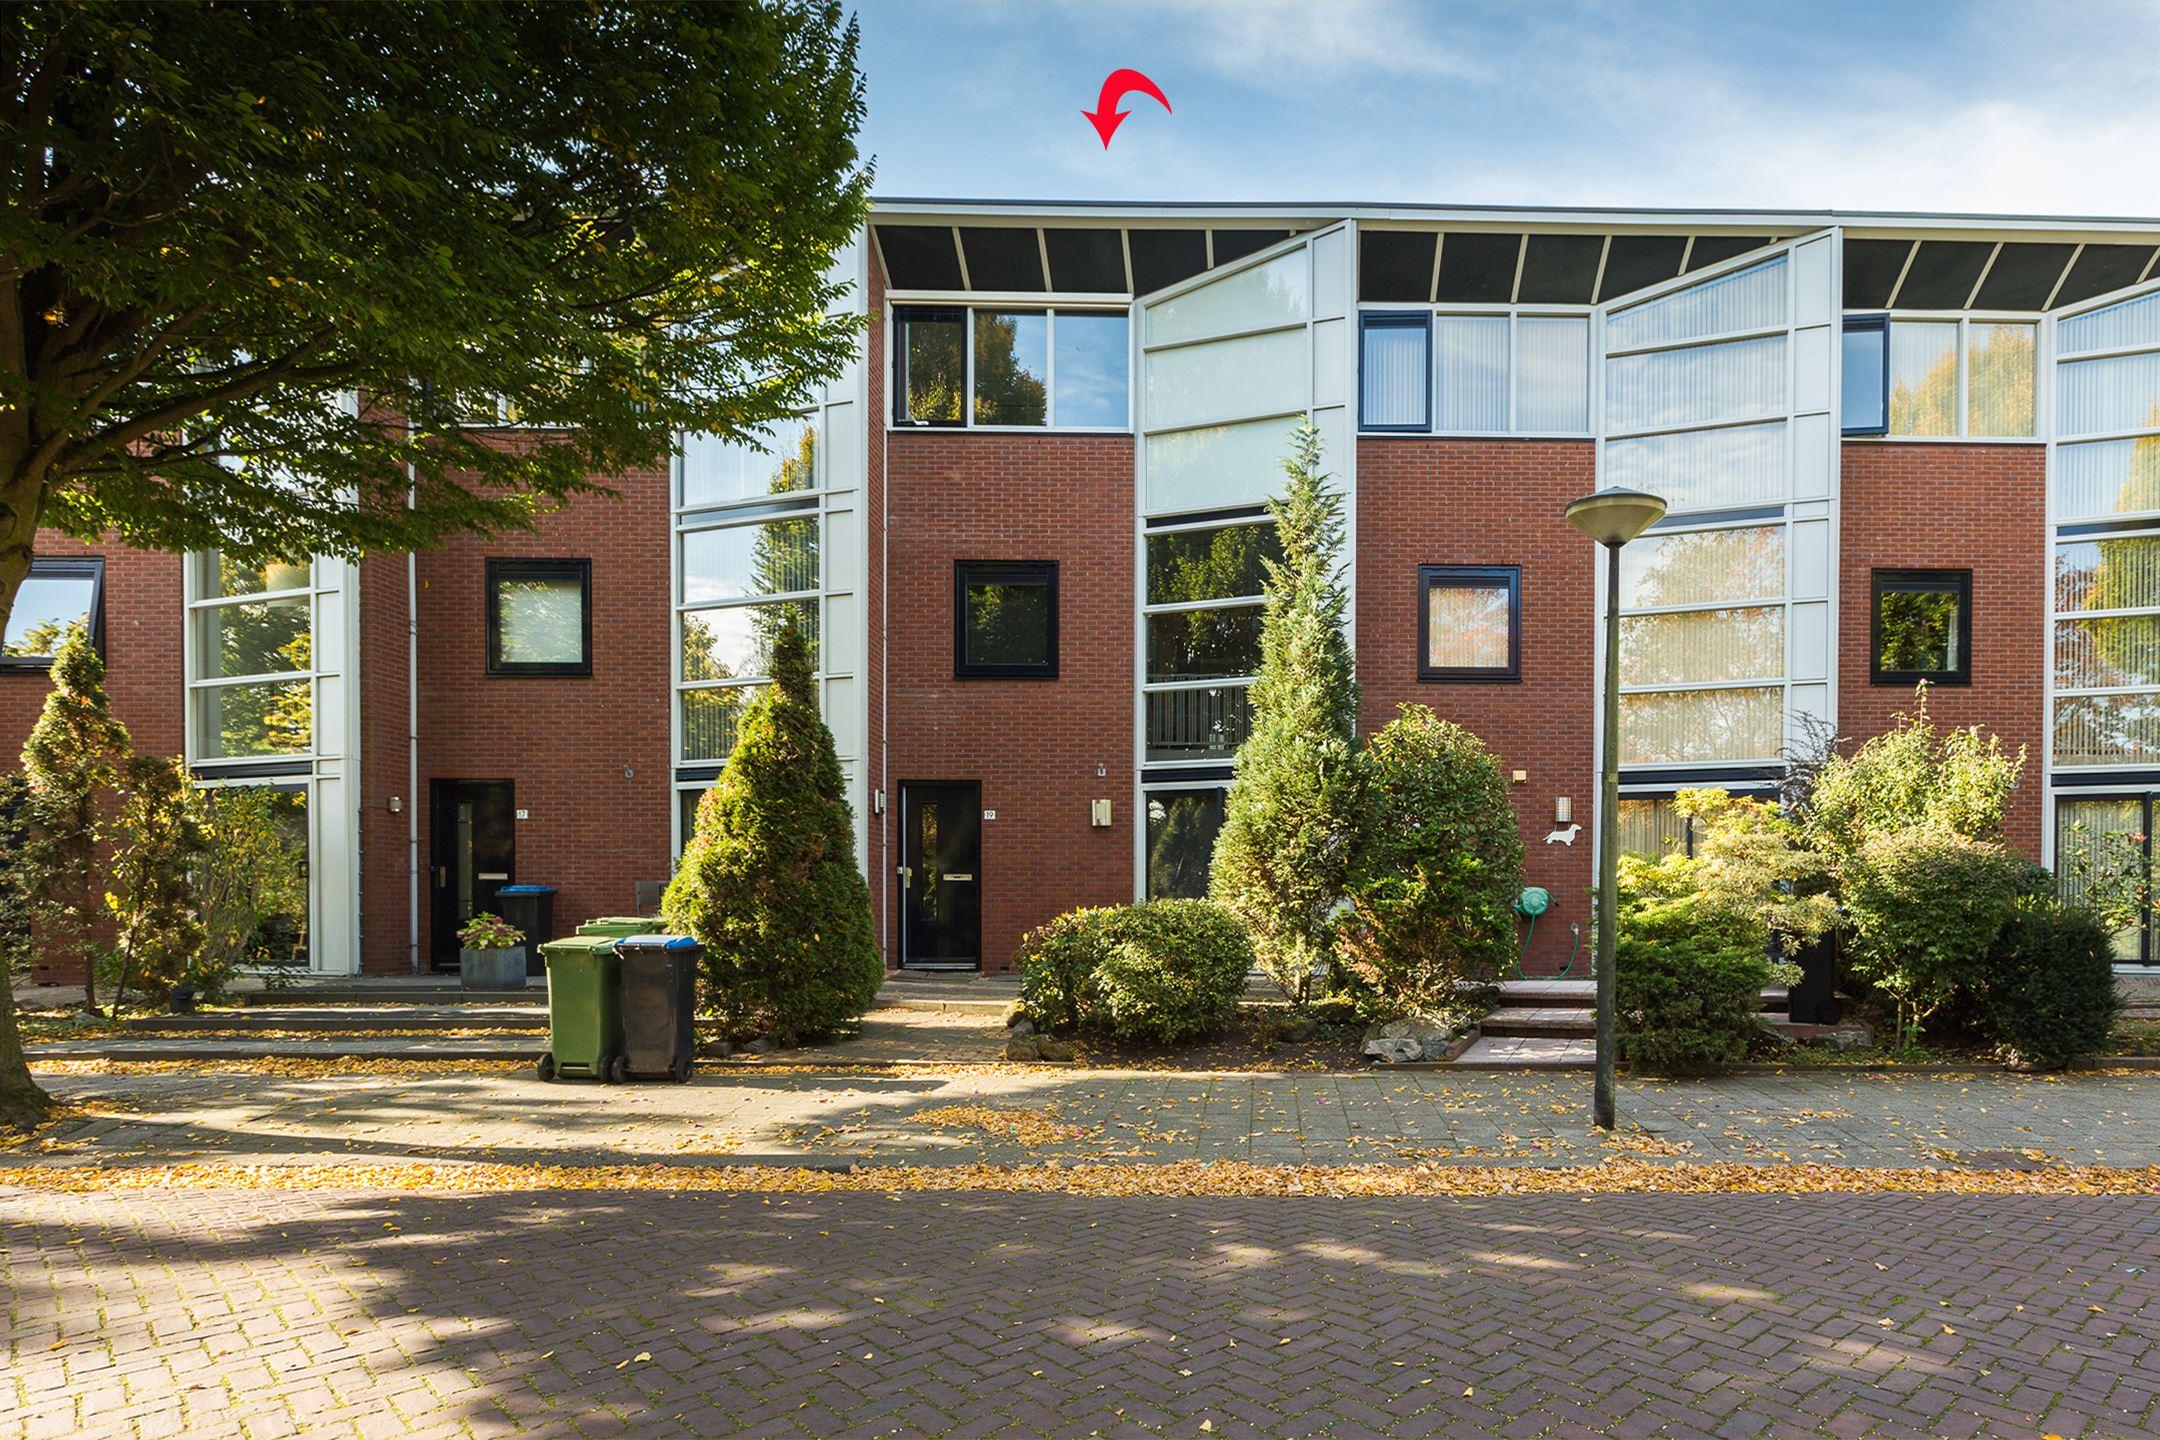 Zonwering Slaapkamer 19 : Verkocht aletta jacobskade tg vlaardingen funda